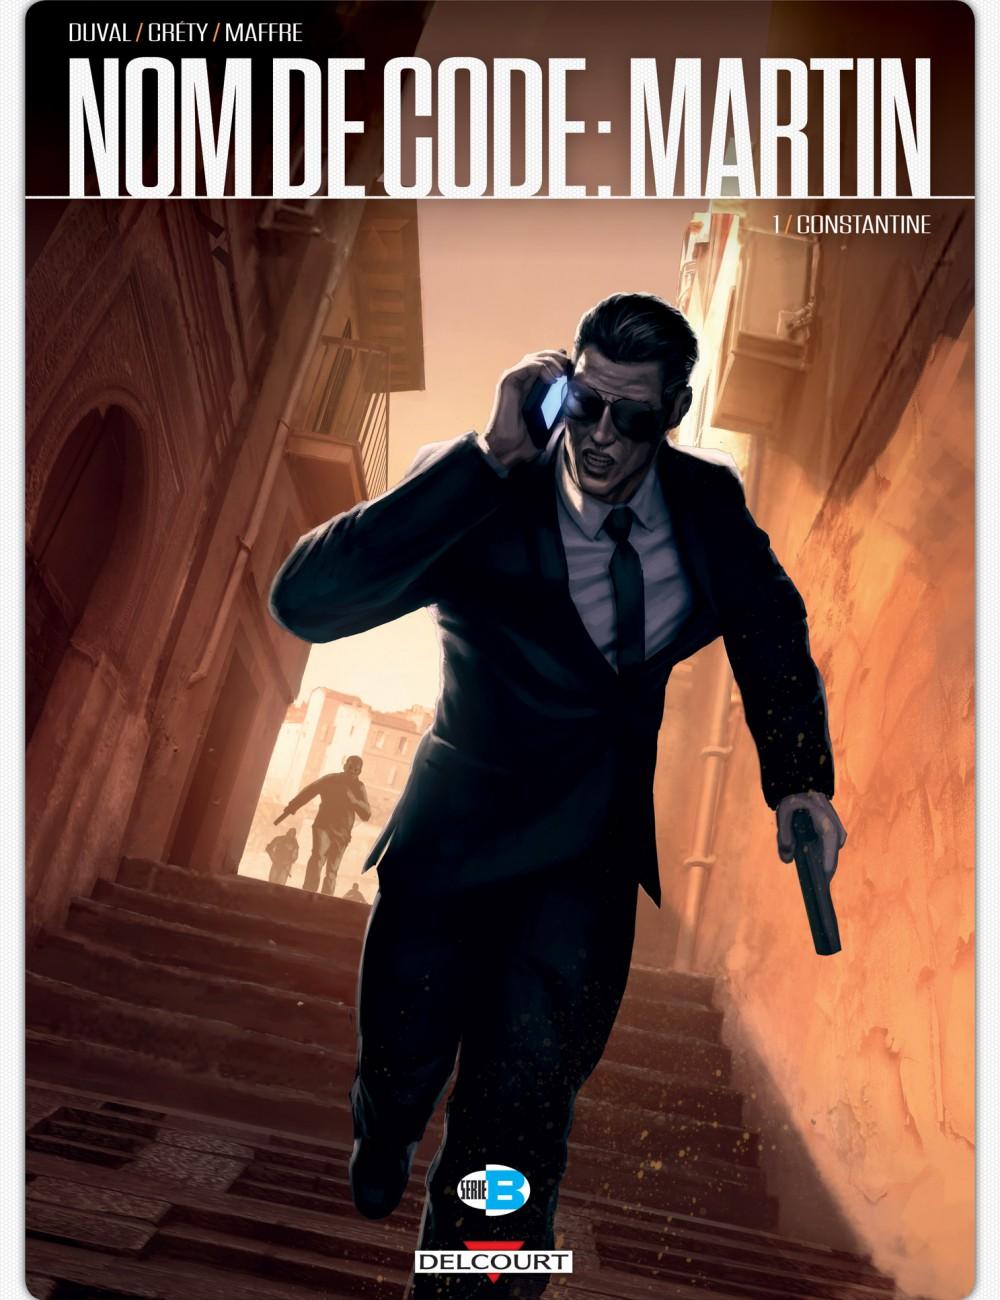 nom-de-code-martin-01-constantine